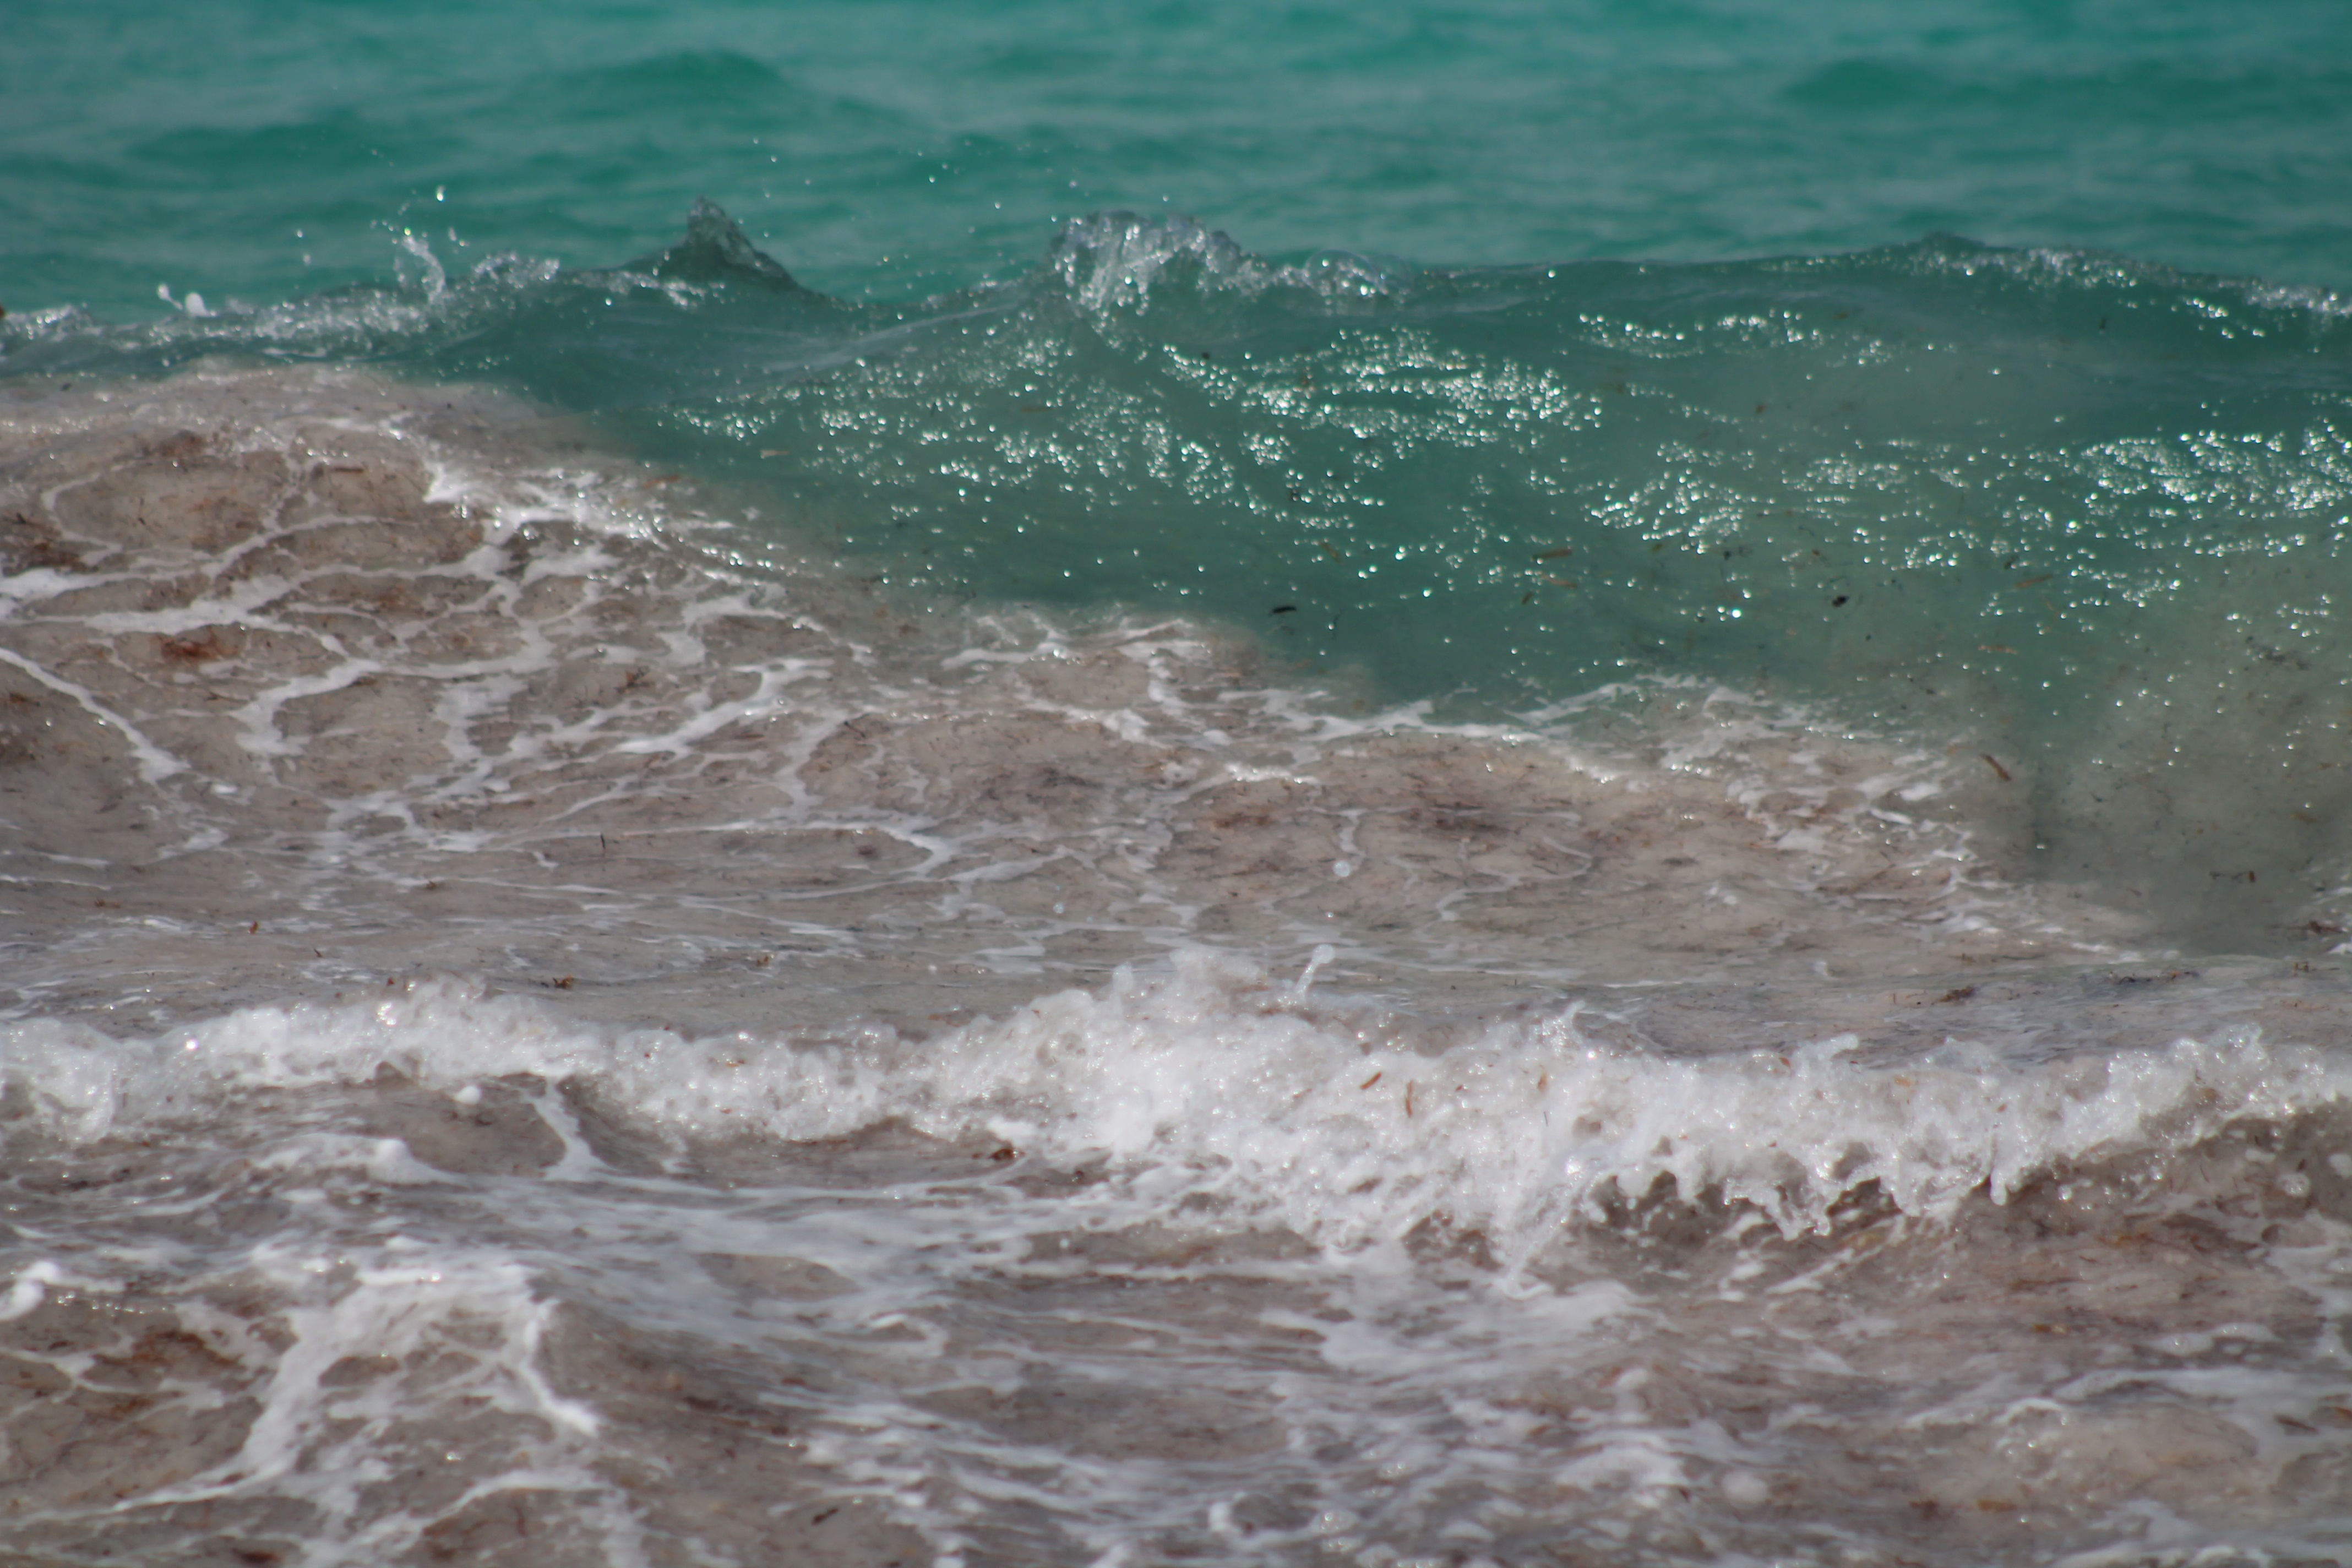 this wave IMG_1883.jpg